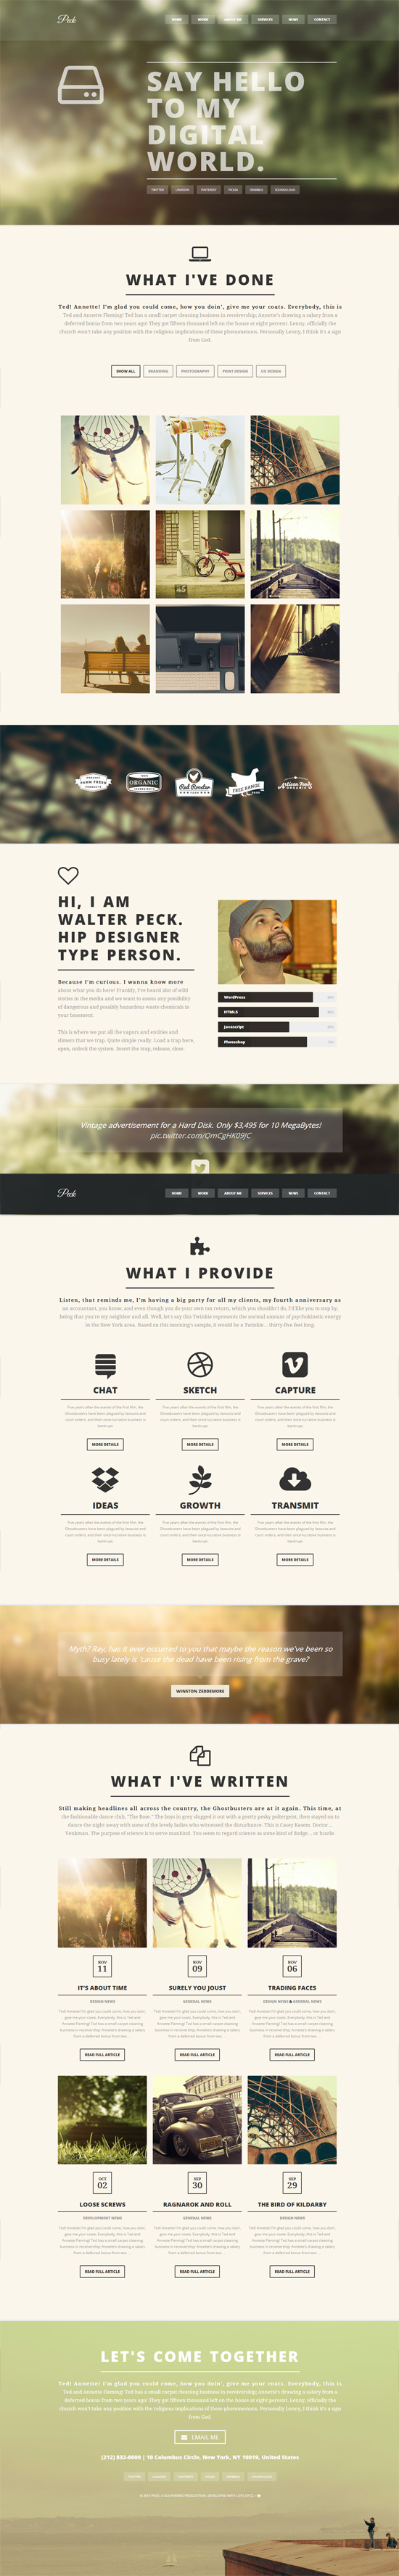 PECK - Creative One Page WordPress Theme